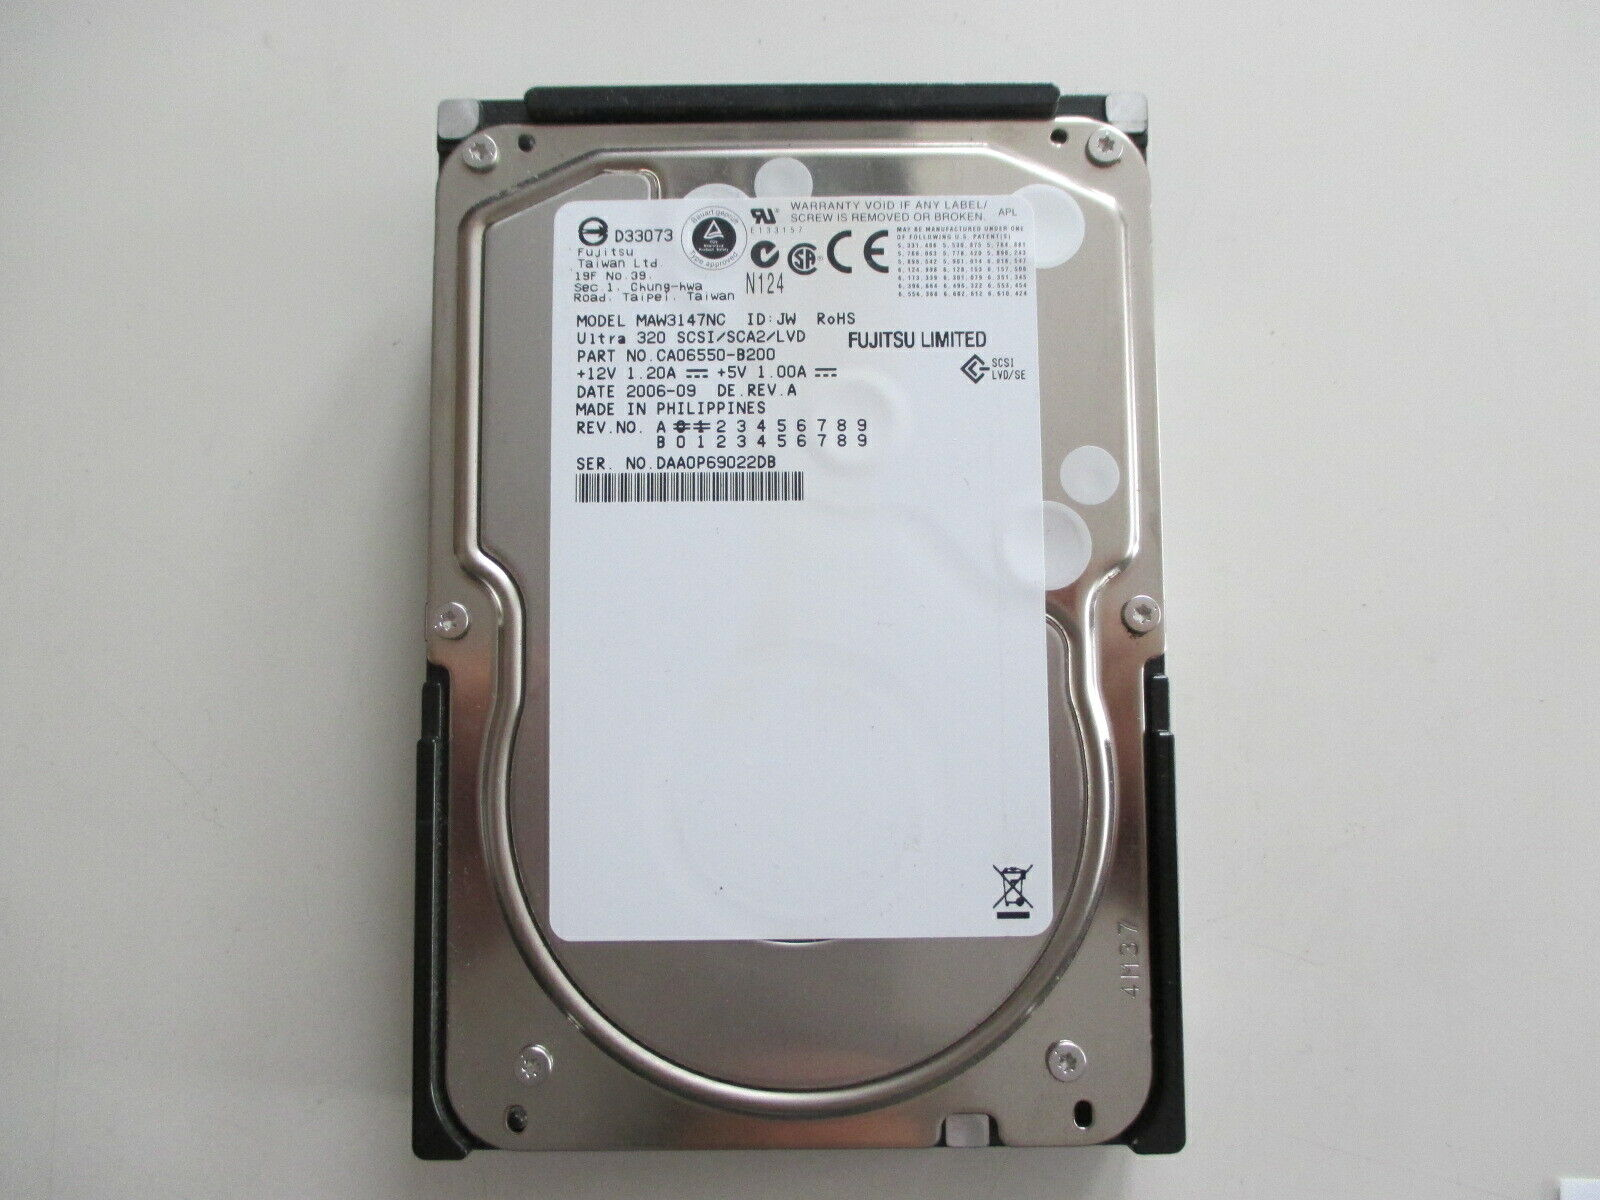 FUJITSU 147 GB MAW3147NC SCSI SCA 80-pin HDD Test ok siehe Foto